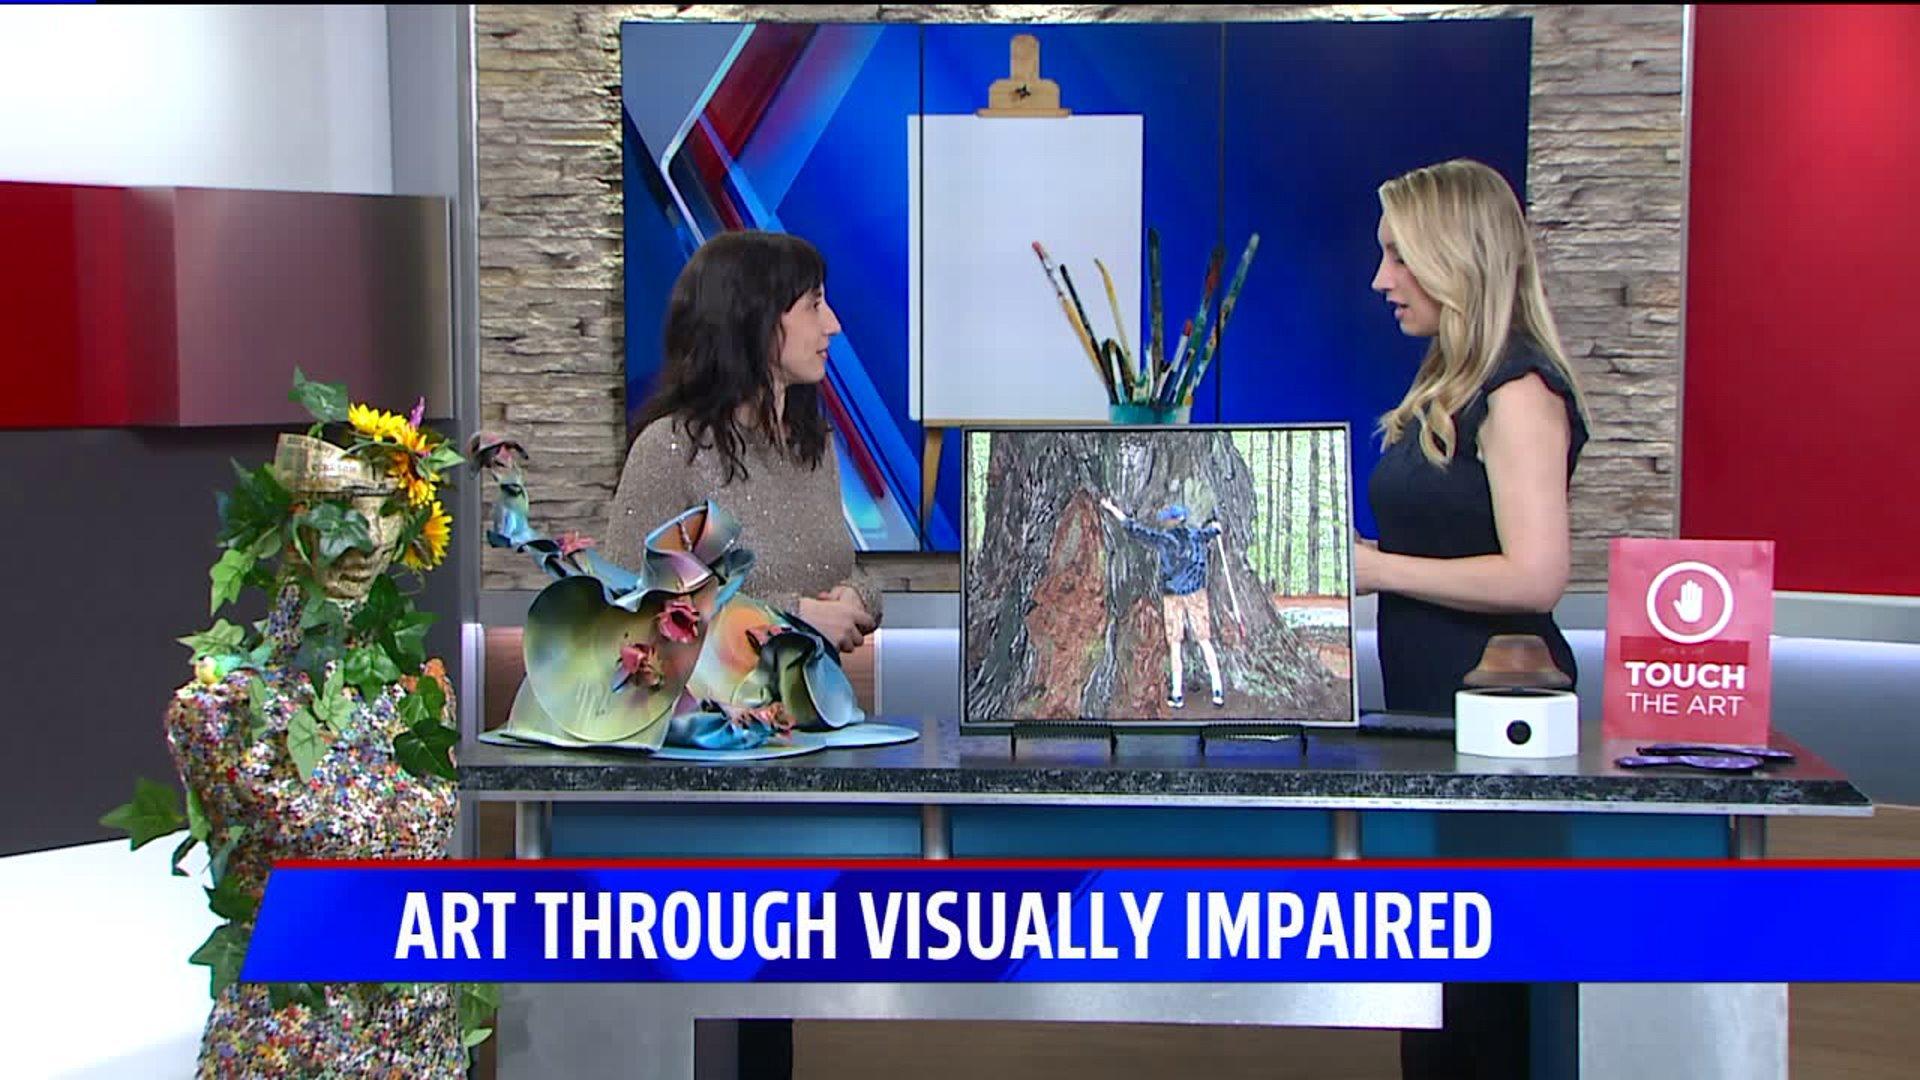 reVISION art exhibit explores art through eyes of visually impaired | FOX59